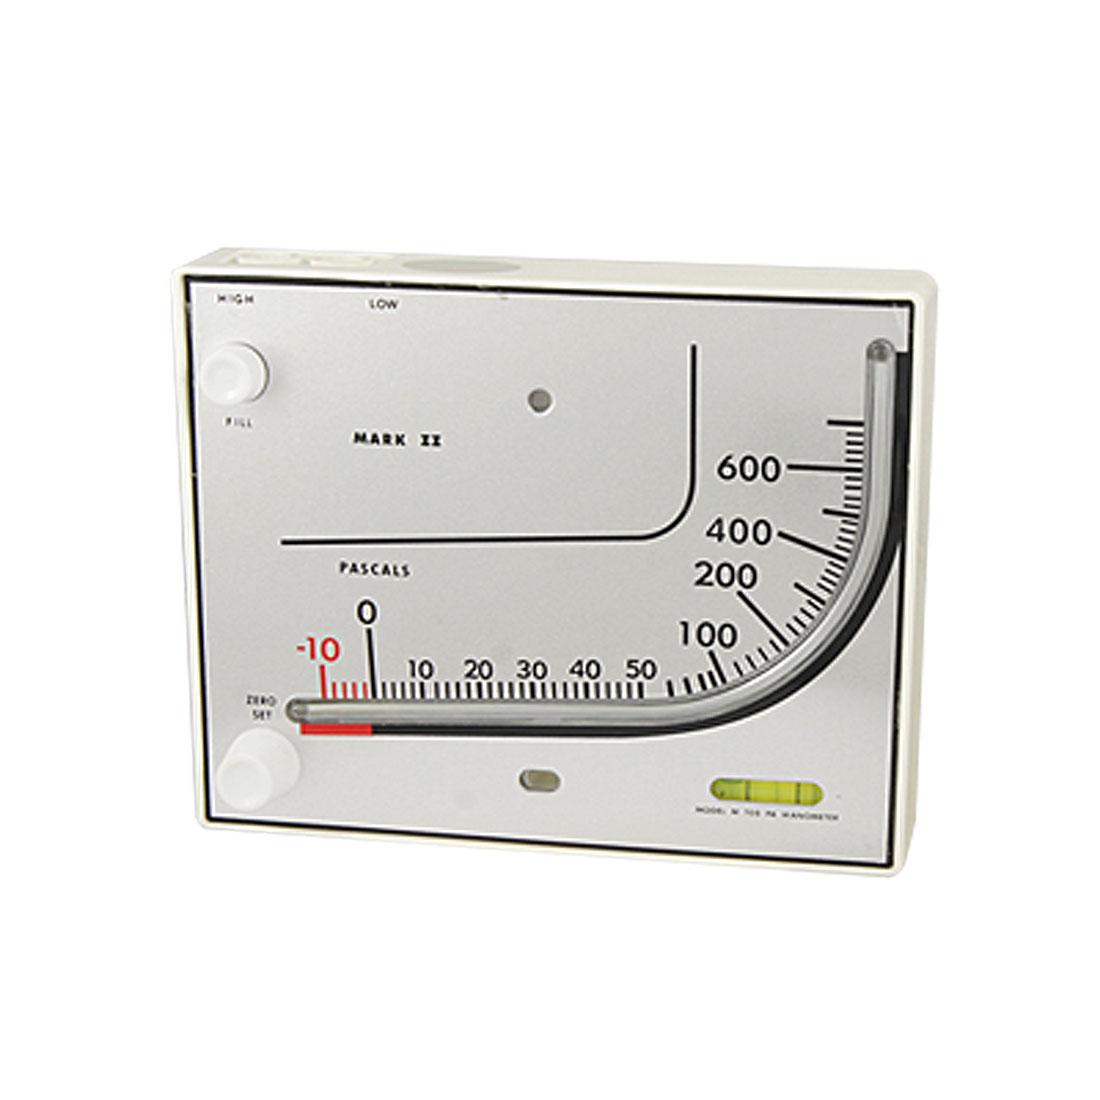 -10-700Pa Differential Pressure Inclined Liquid Manometer Gauge